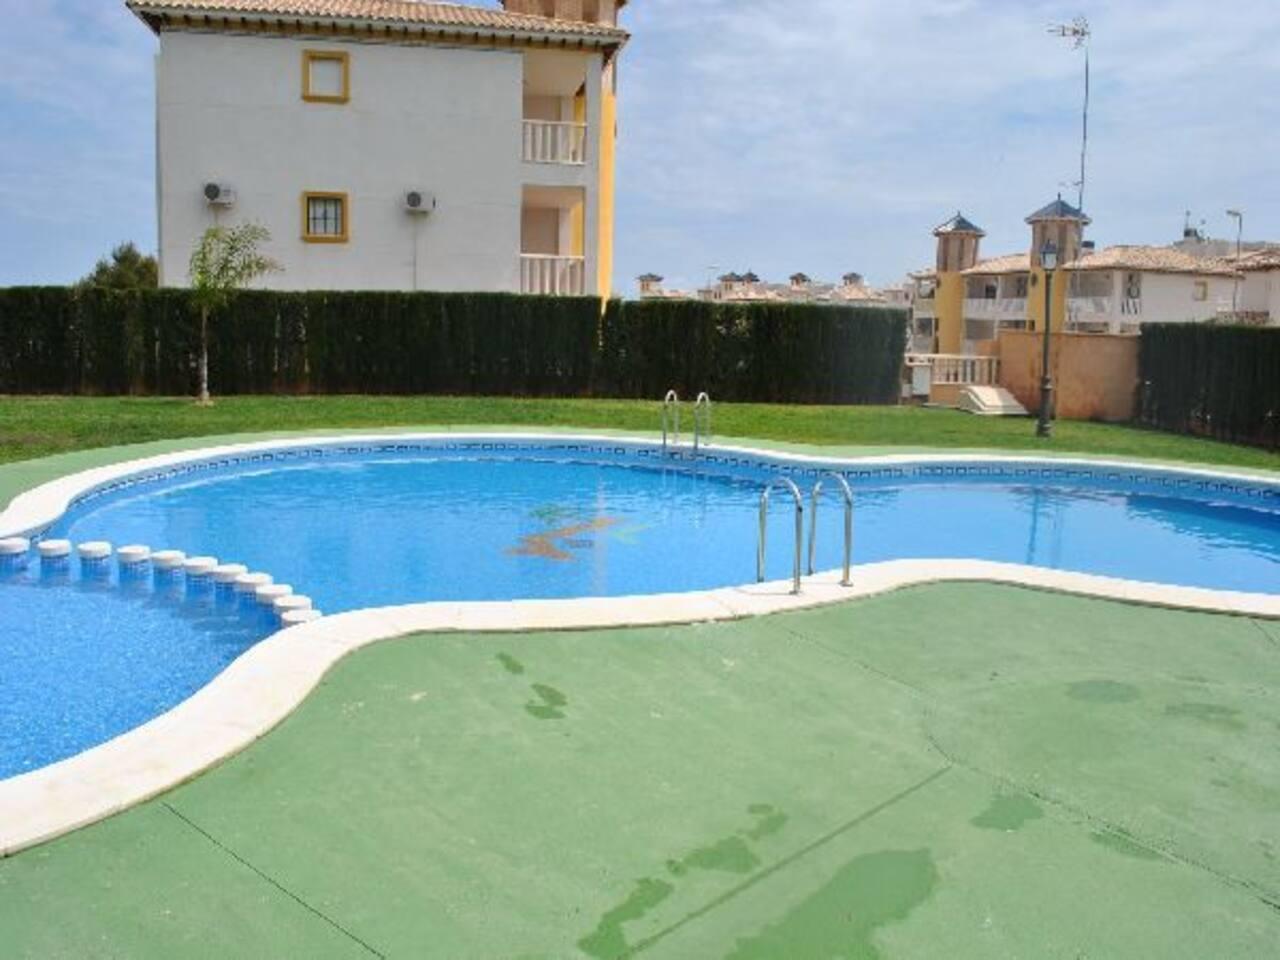 Playa Golf R5 1st flr apartment & comm pool P232 0